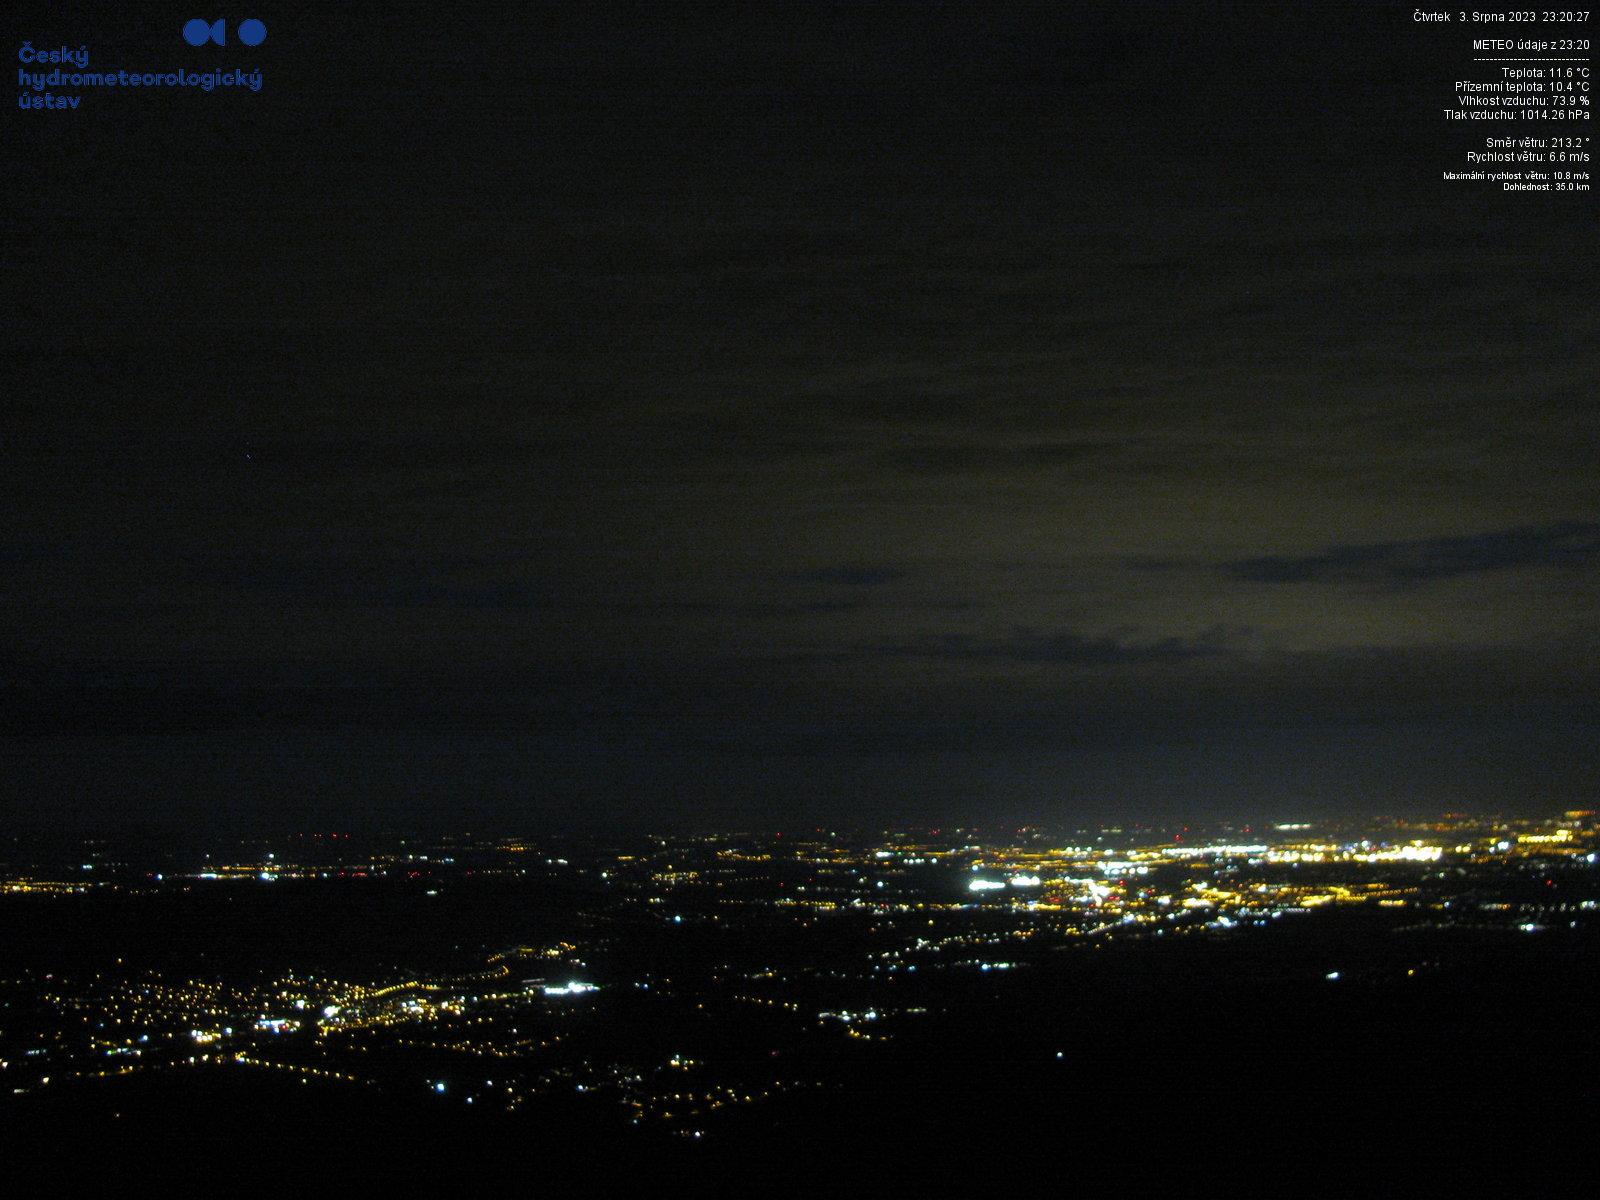 Kamera na żywo - Łysa Góra